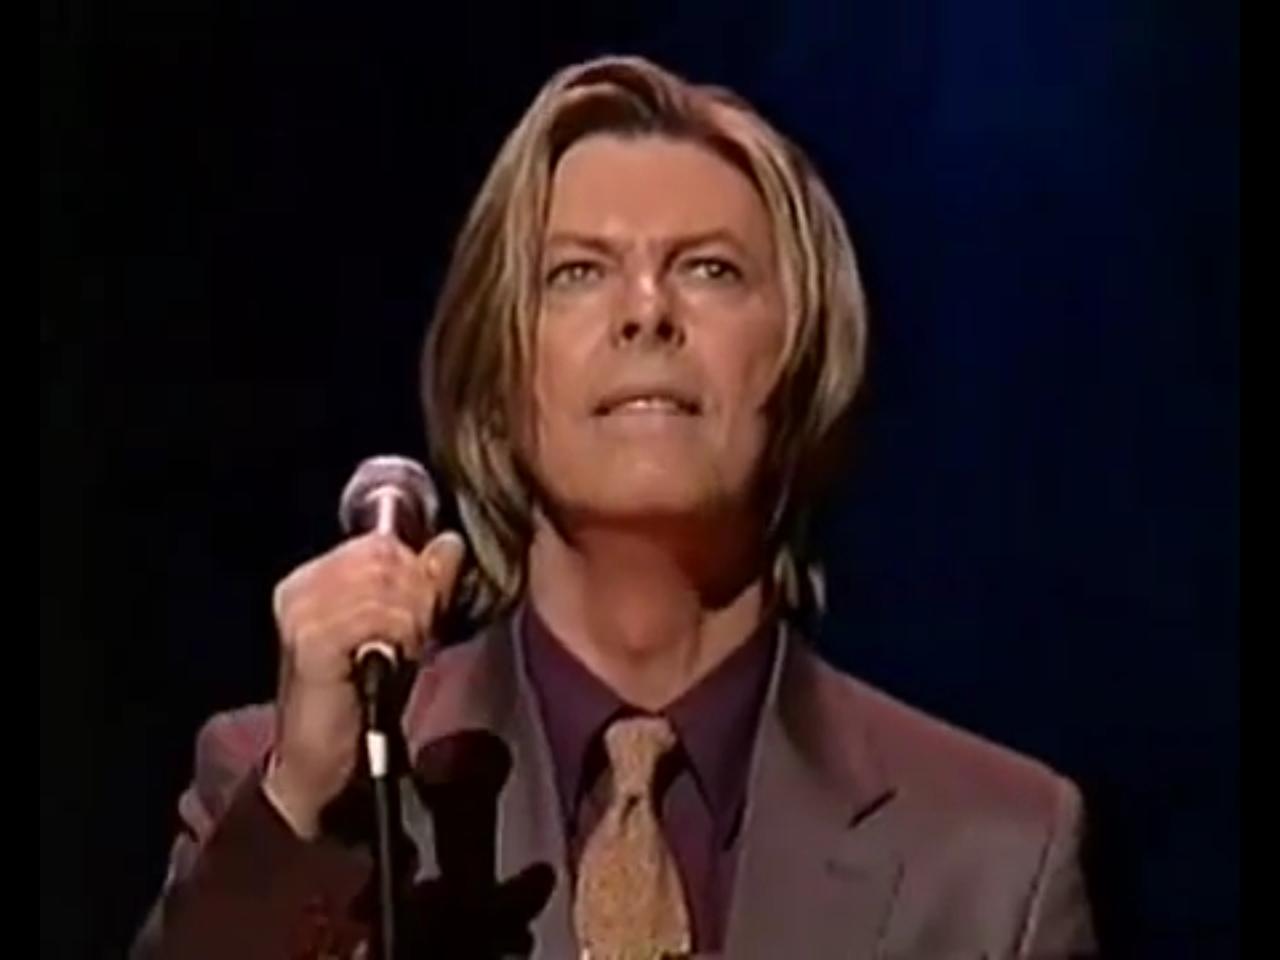 David Bowies Glorious Long Hair 1999 2000 David Bowie Ziggy David Bowie David Bowie Ziggy Stardust